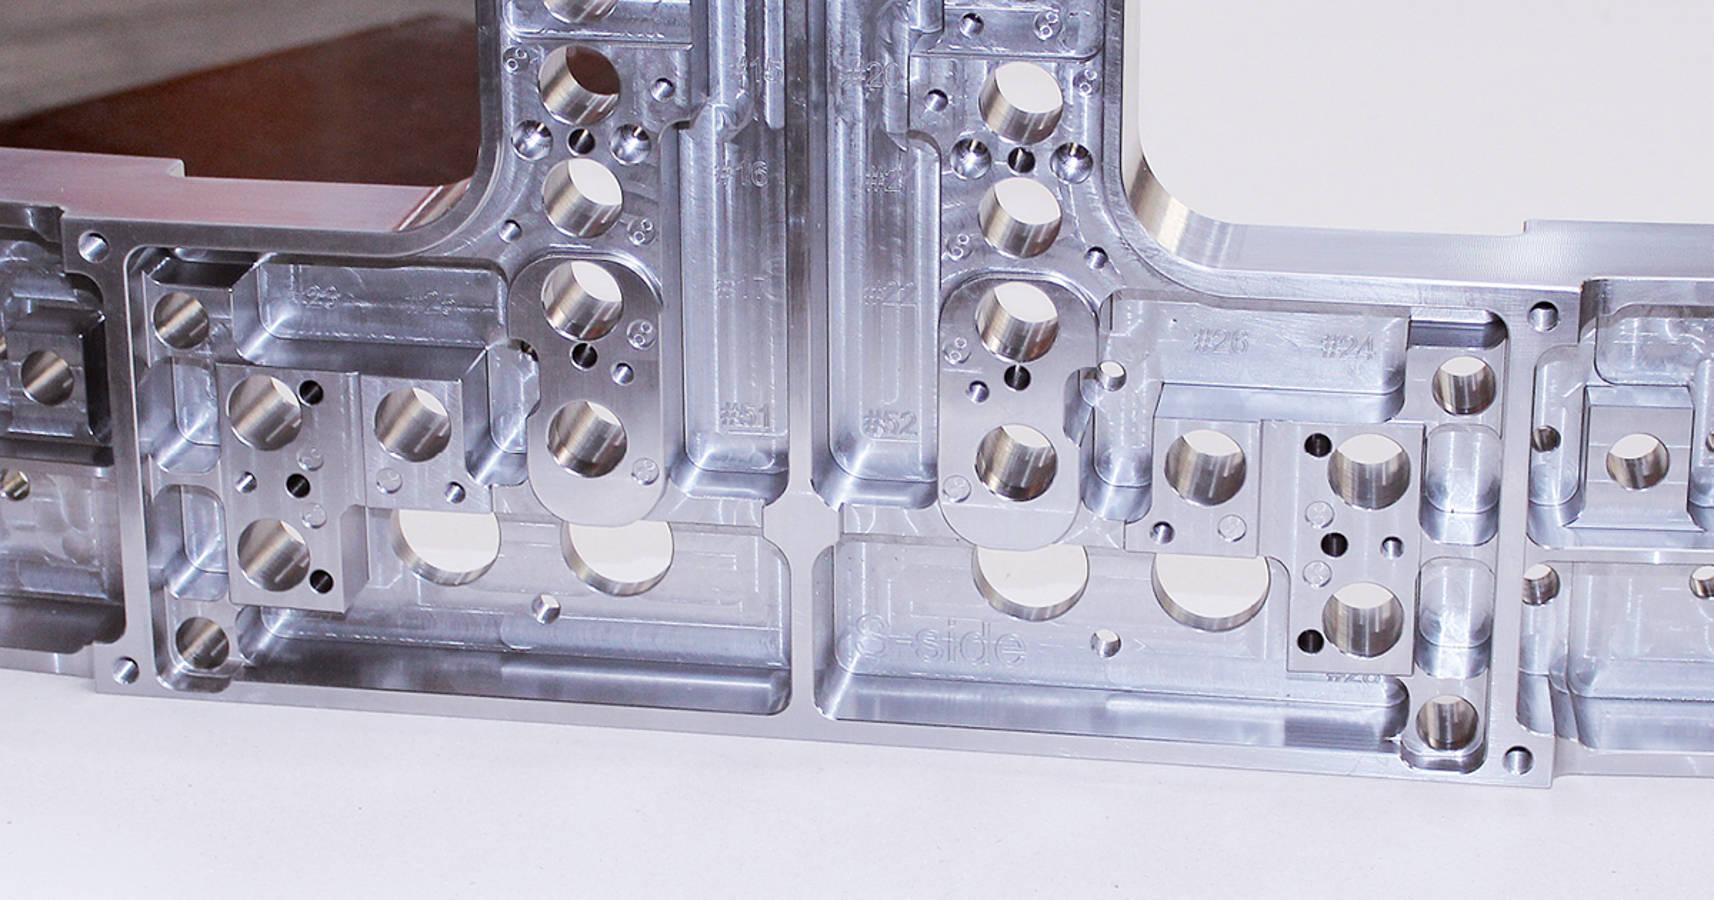 mechanik1.jpg